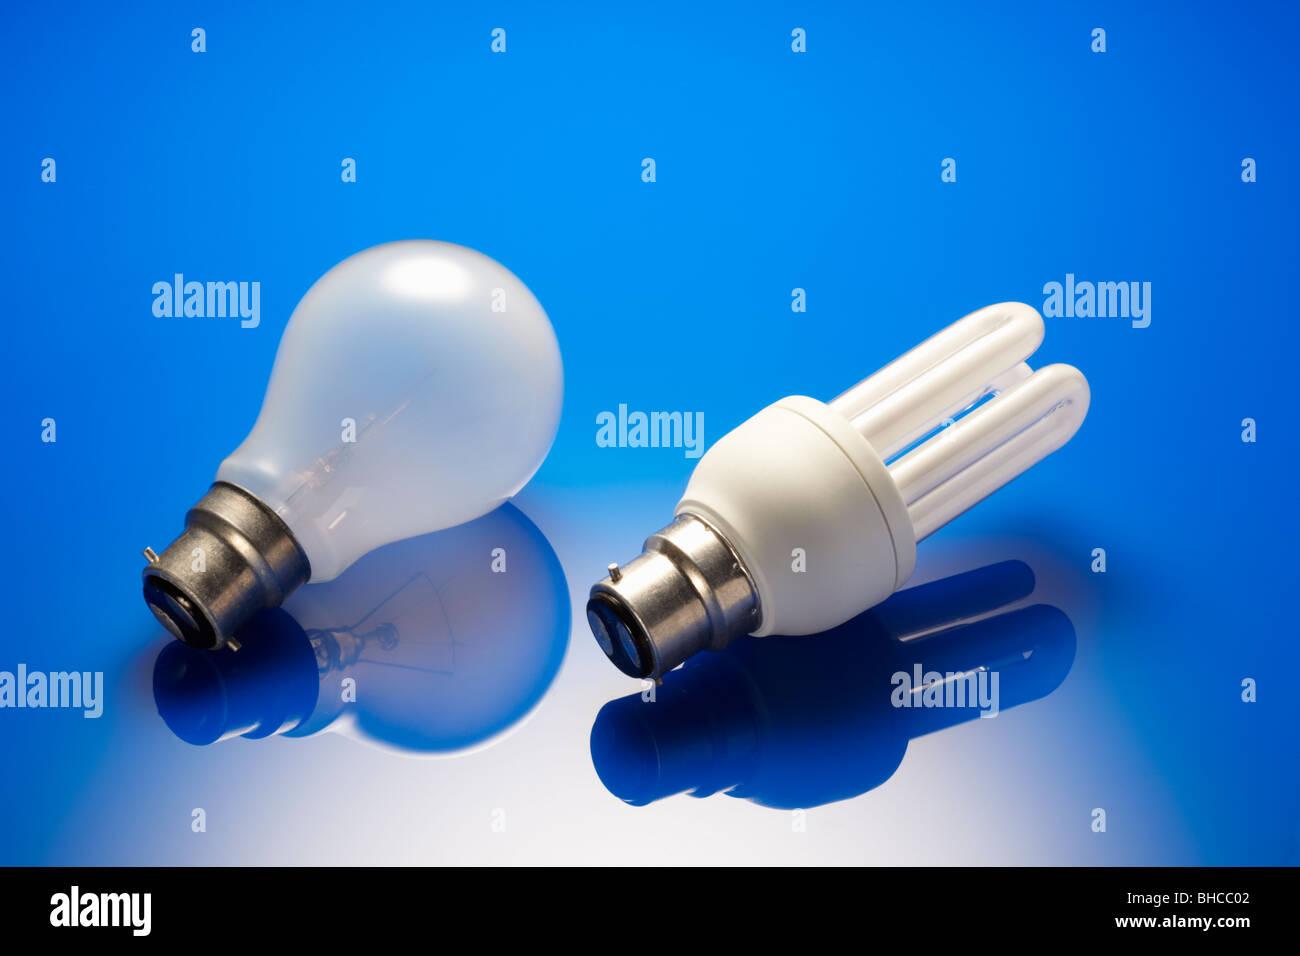 Energiesparende Glühbirne und Standard Glühbirne Stockbild